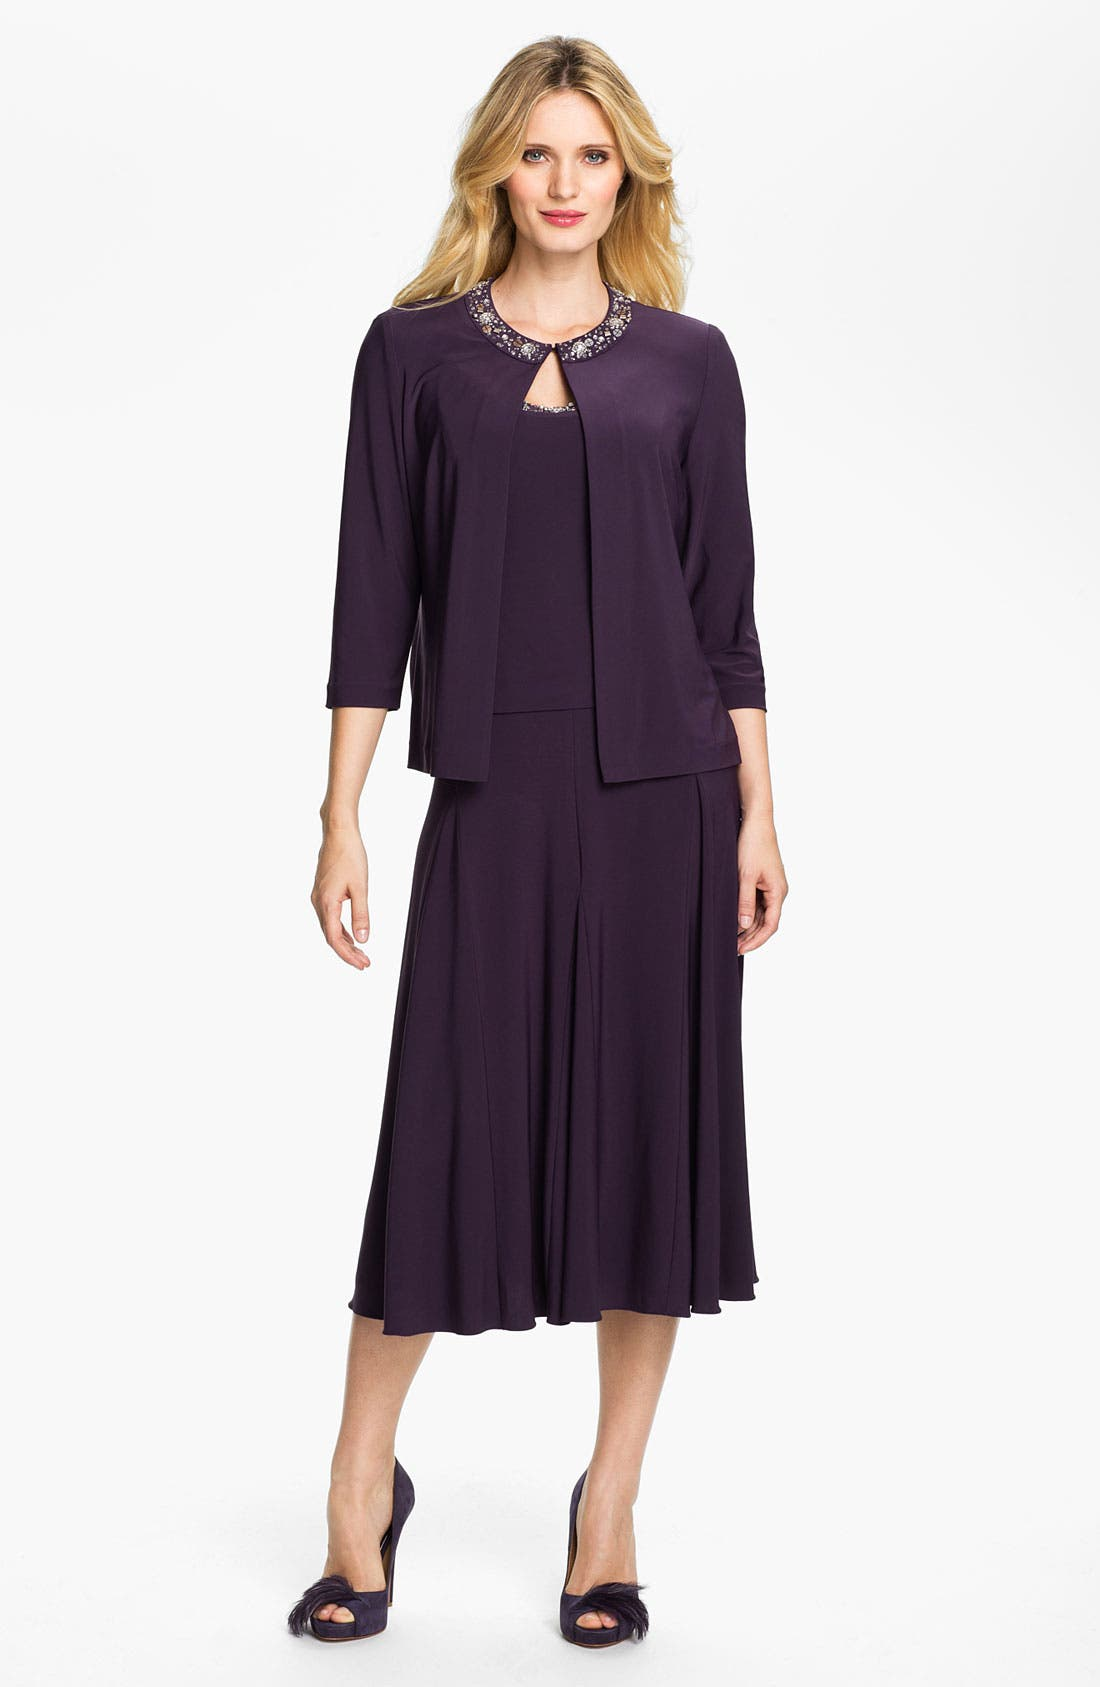 Main Image - Alex Evenings Beaded Jersey Dress & Jacket